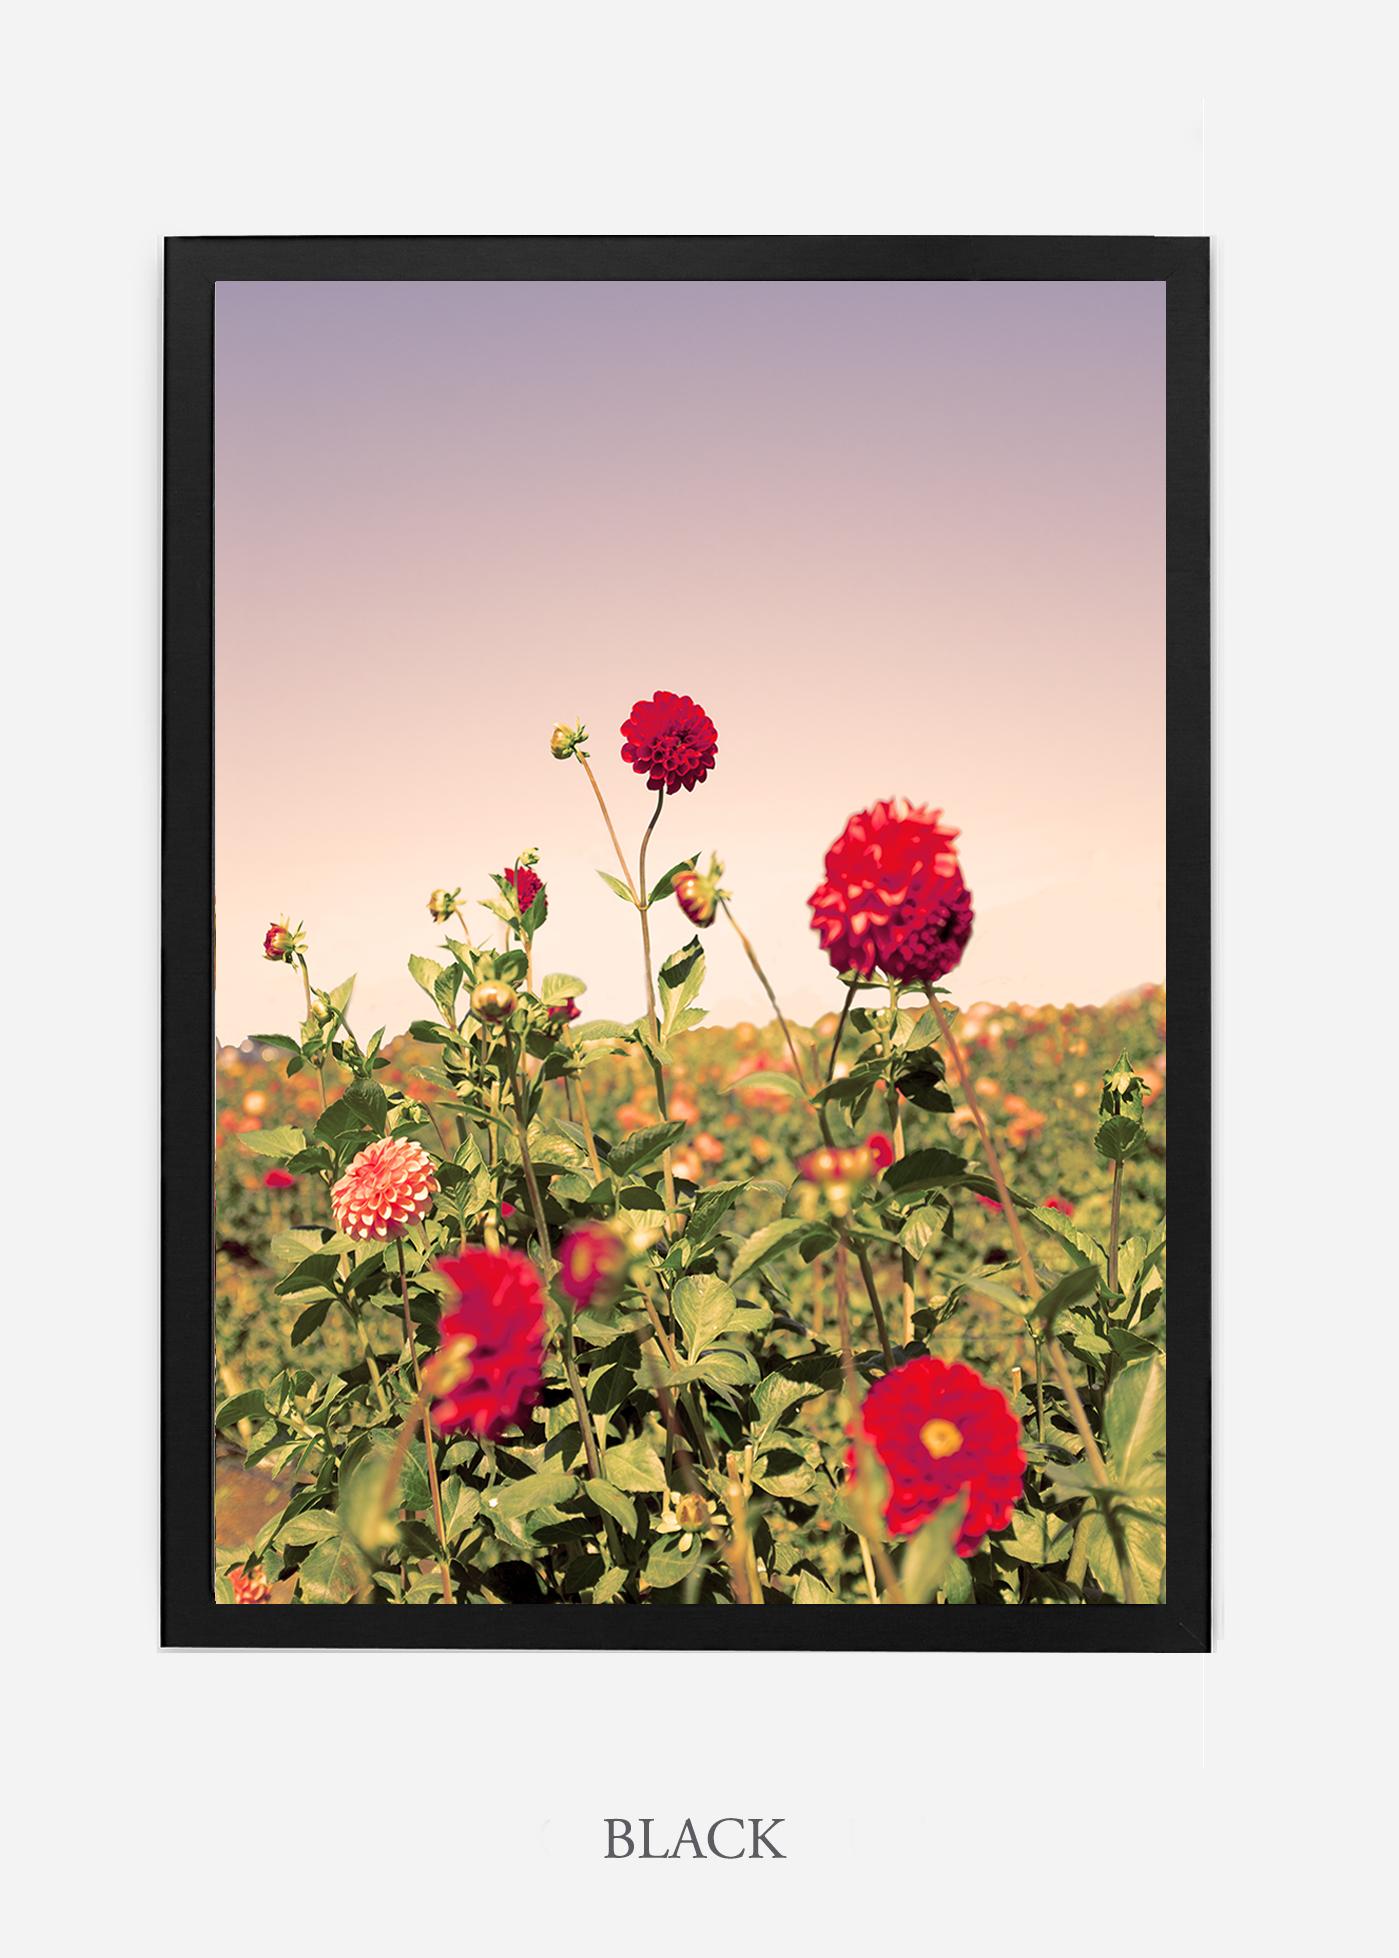 wilder-california-dahlia-print-botanical-red-interior-design-unframed.jpg